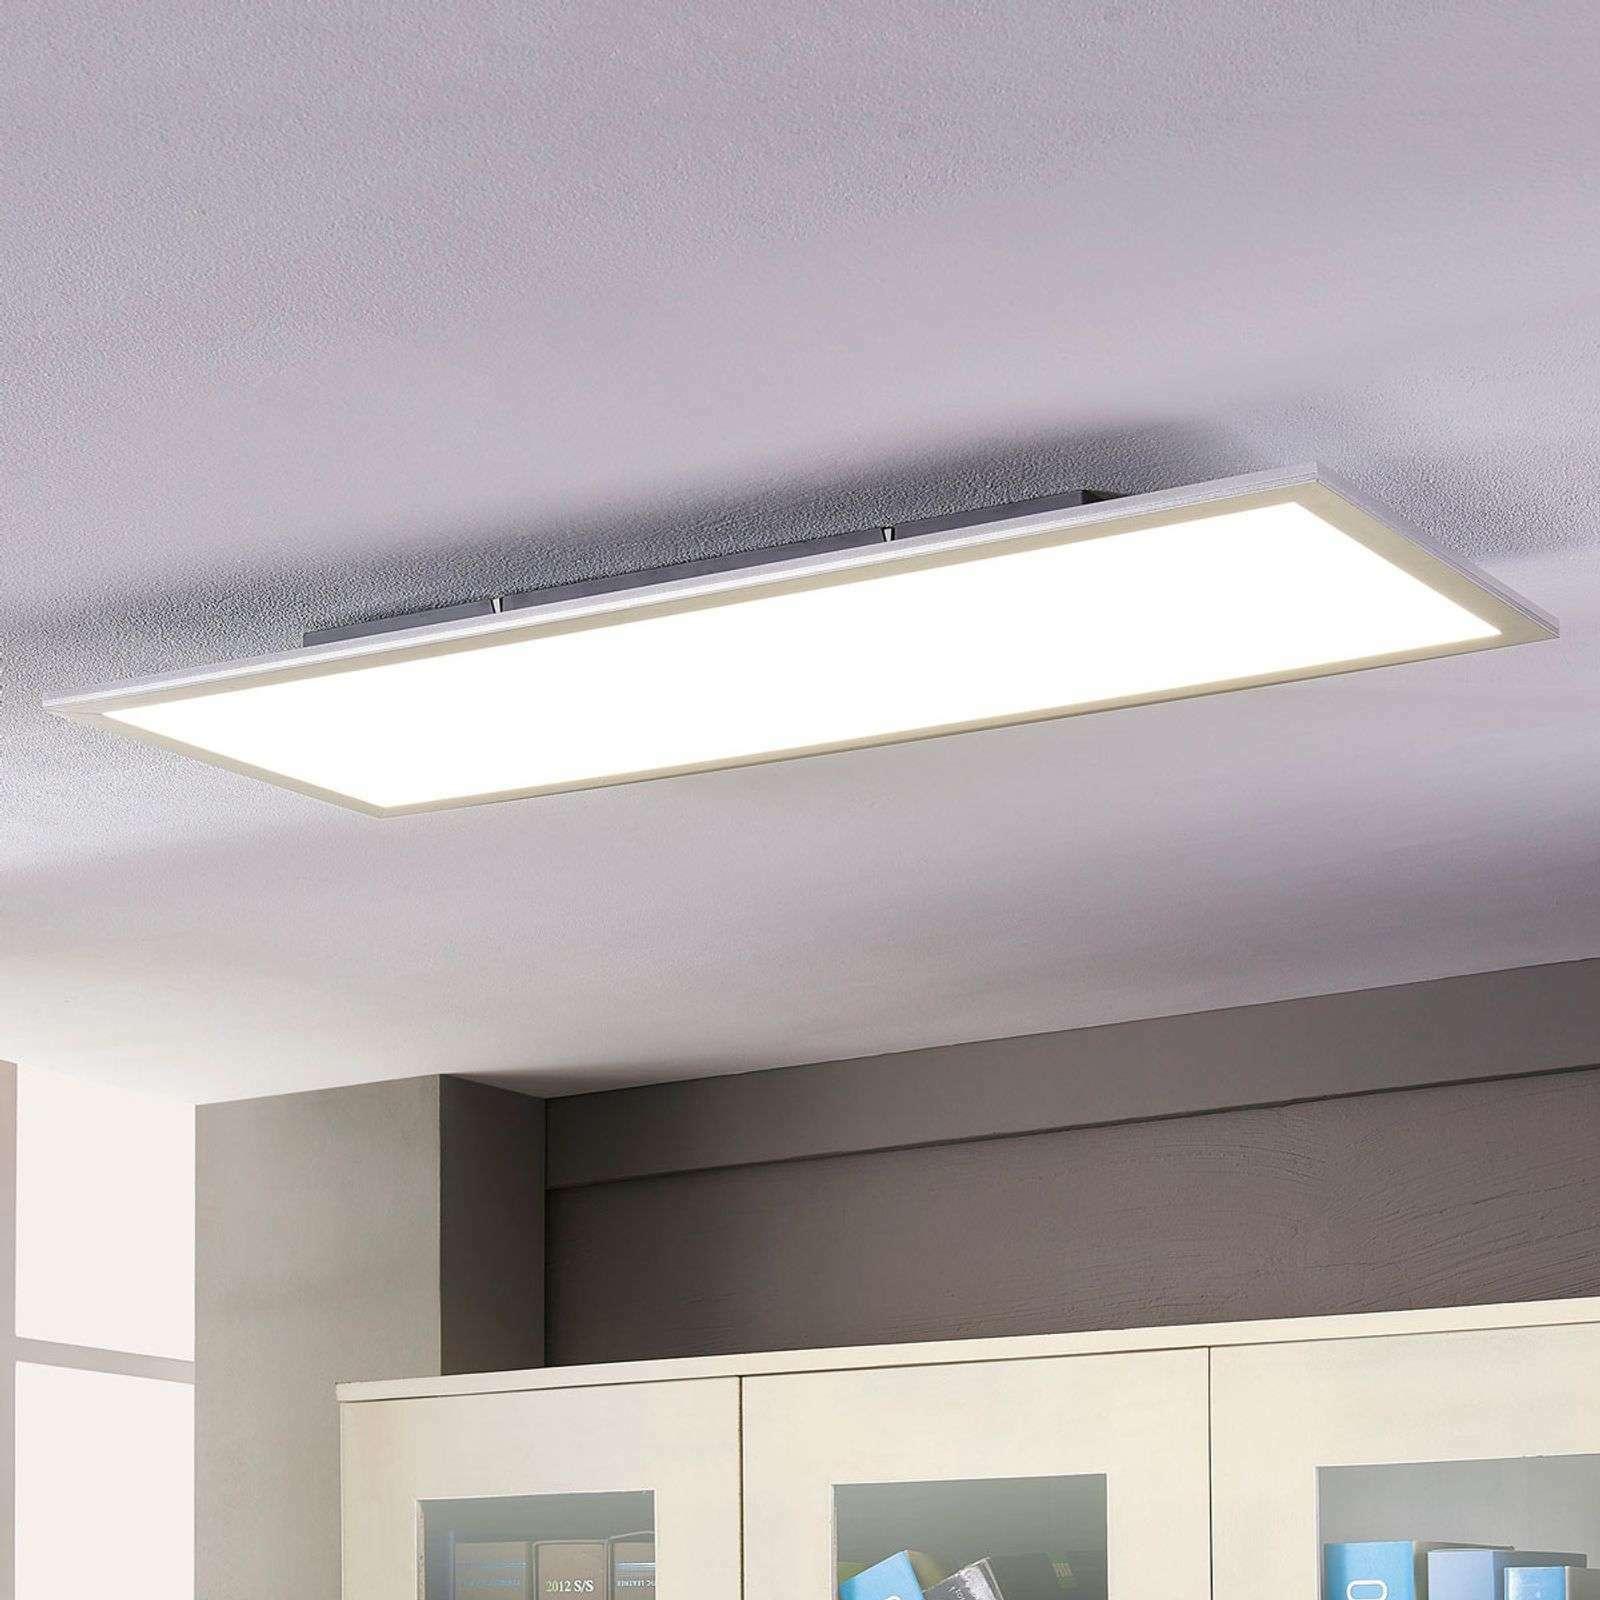 LED Deckenlampe Livel Panel LED Deckenleuchte 40W 4000K Büro Leuchte Lampenwelt